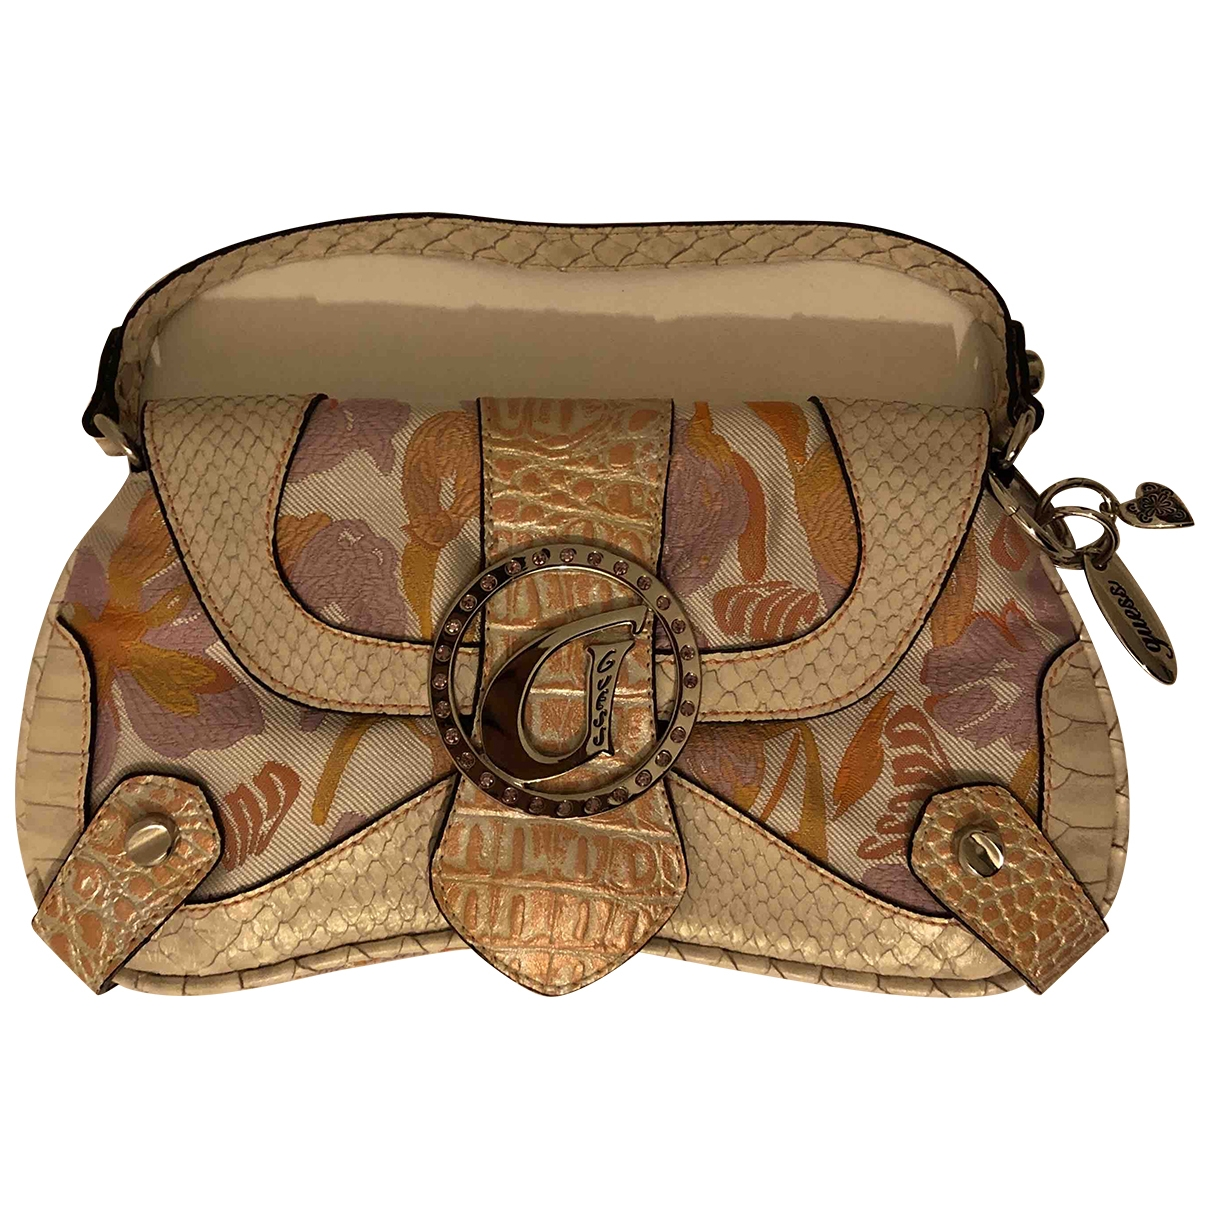 Guess \N Beige Cloth Clutch bag for Women \N